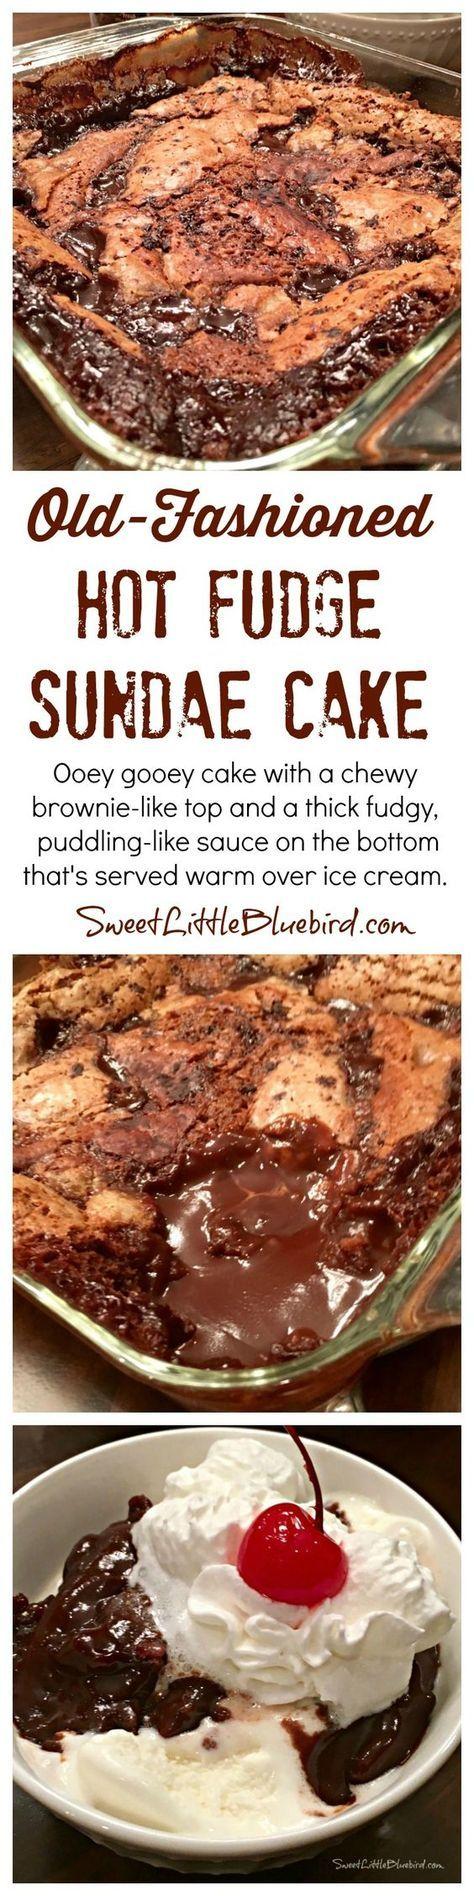 Old fashioned hot fudge sundae cake recipe.